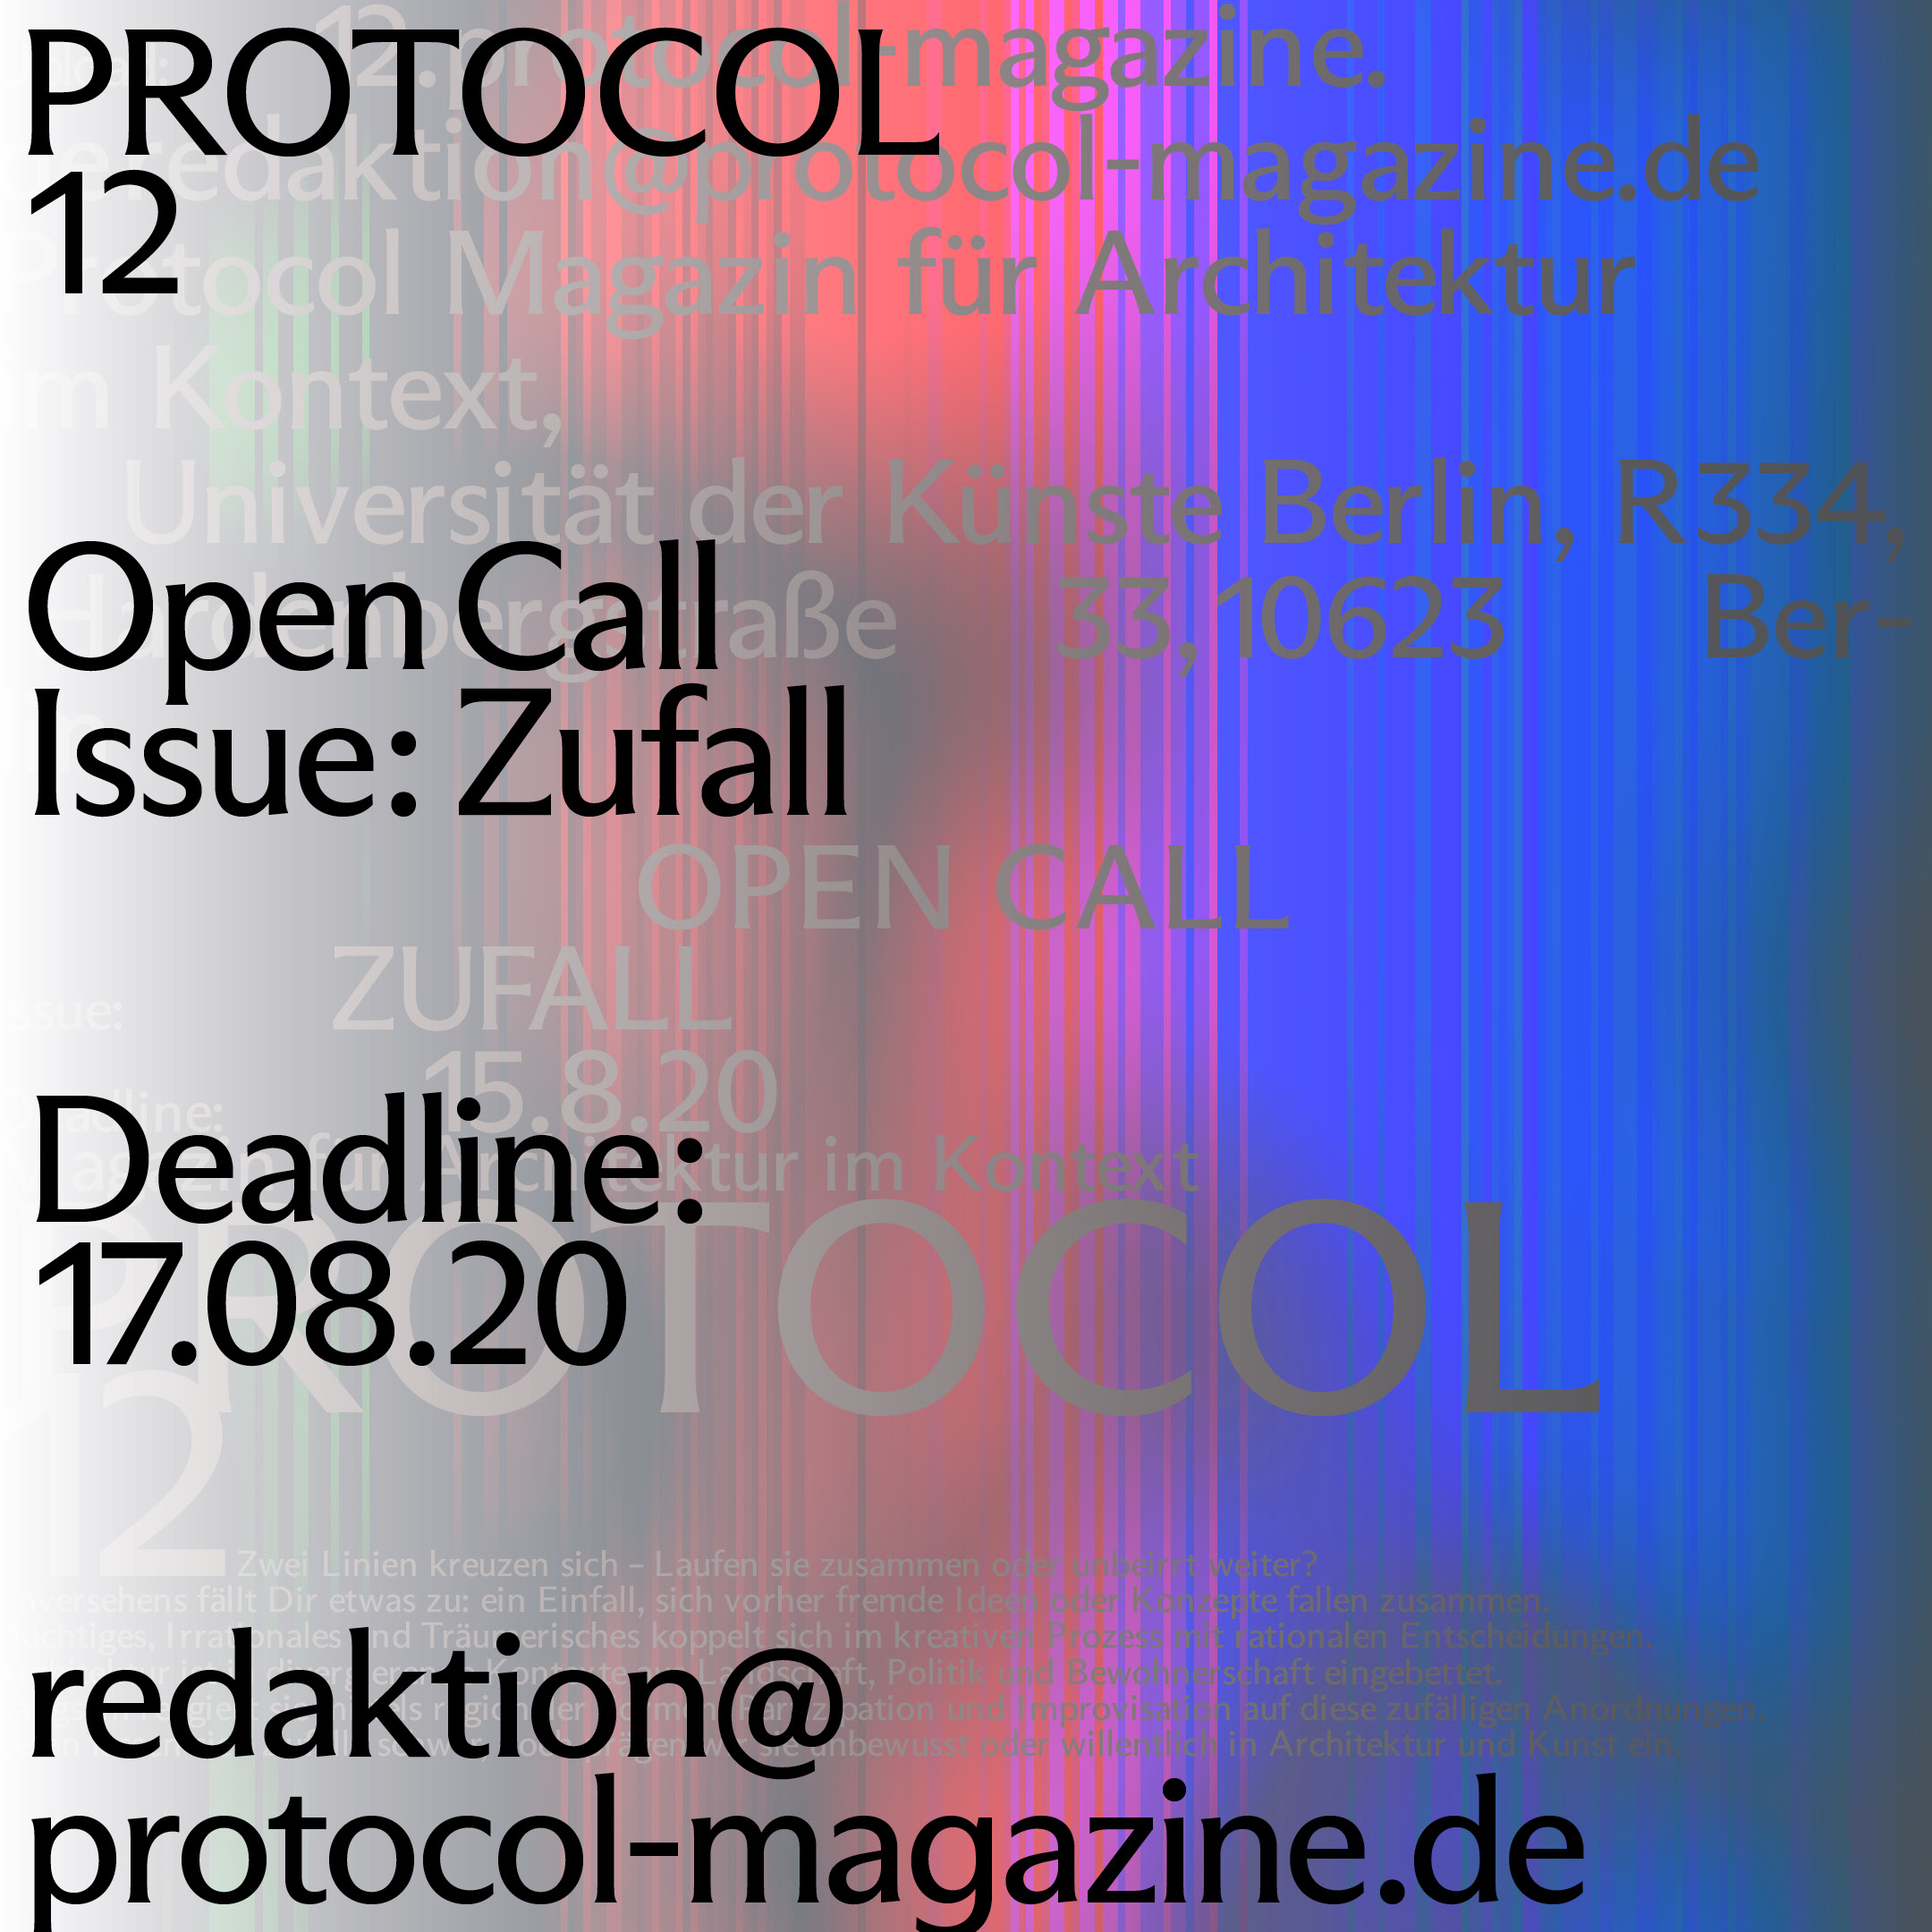 p12_Instagram-Redaktion_Protocol-Magazin_Magazin-fuer-Architektur-im-Kontext15